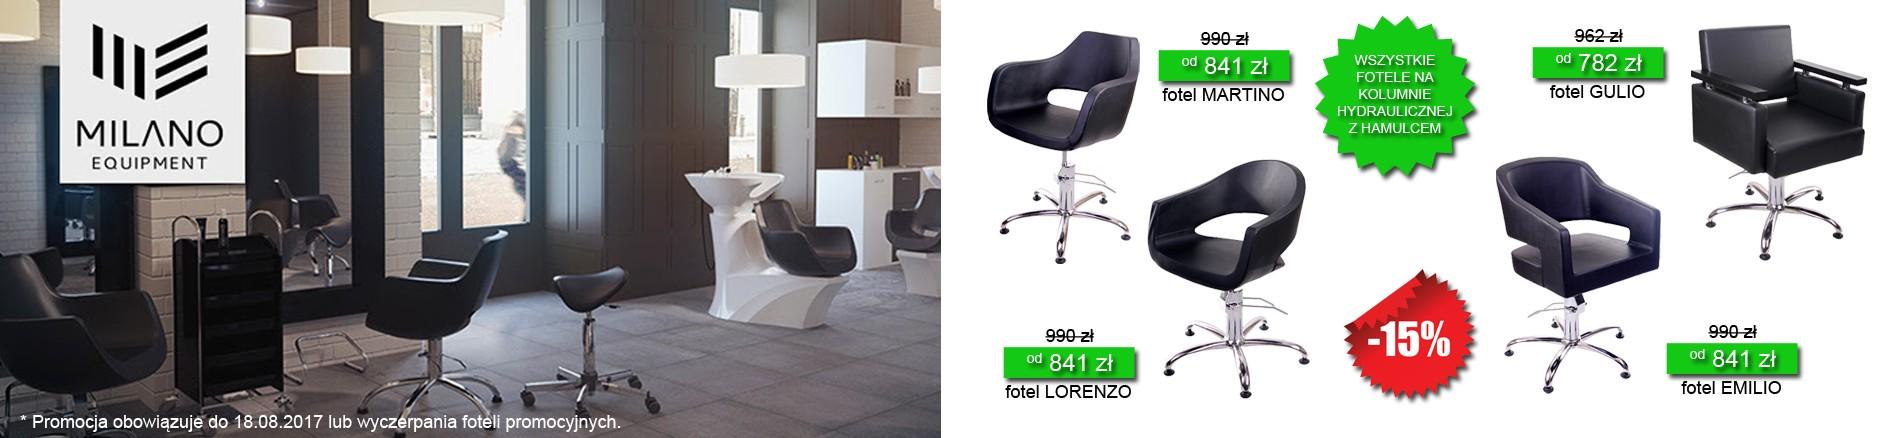 MDM Milano promocja -20% fotel EMILIO LORENZO MARTINO GULIO